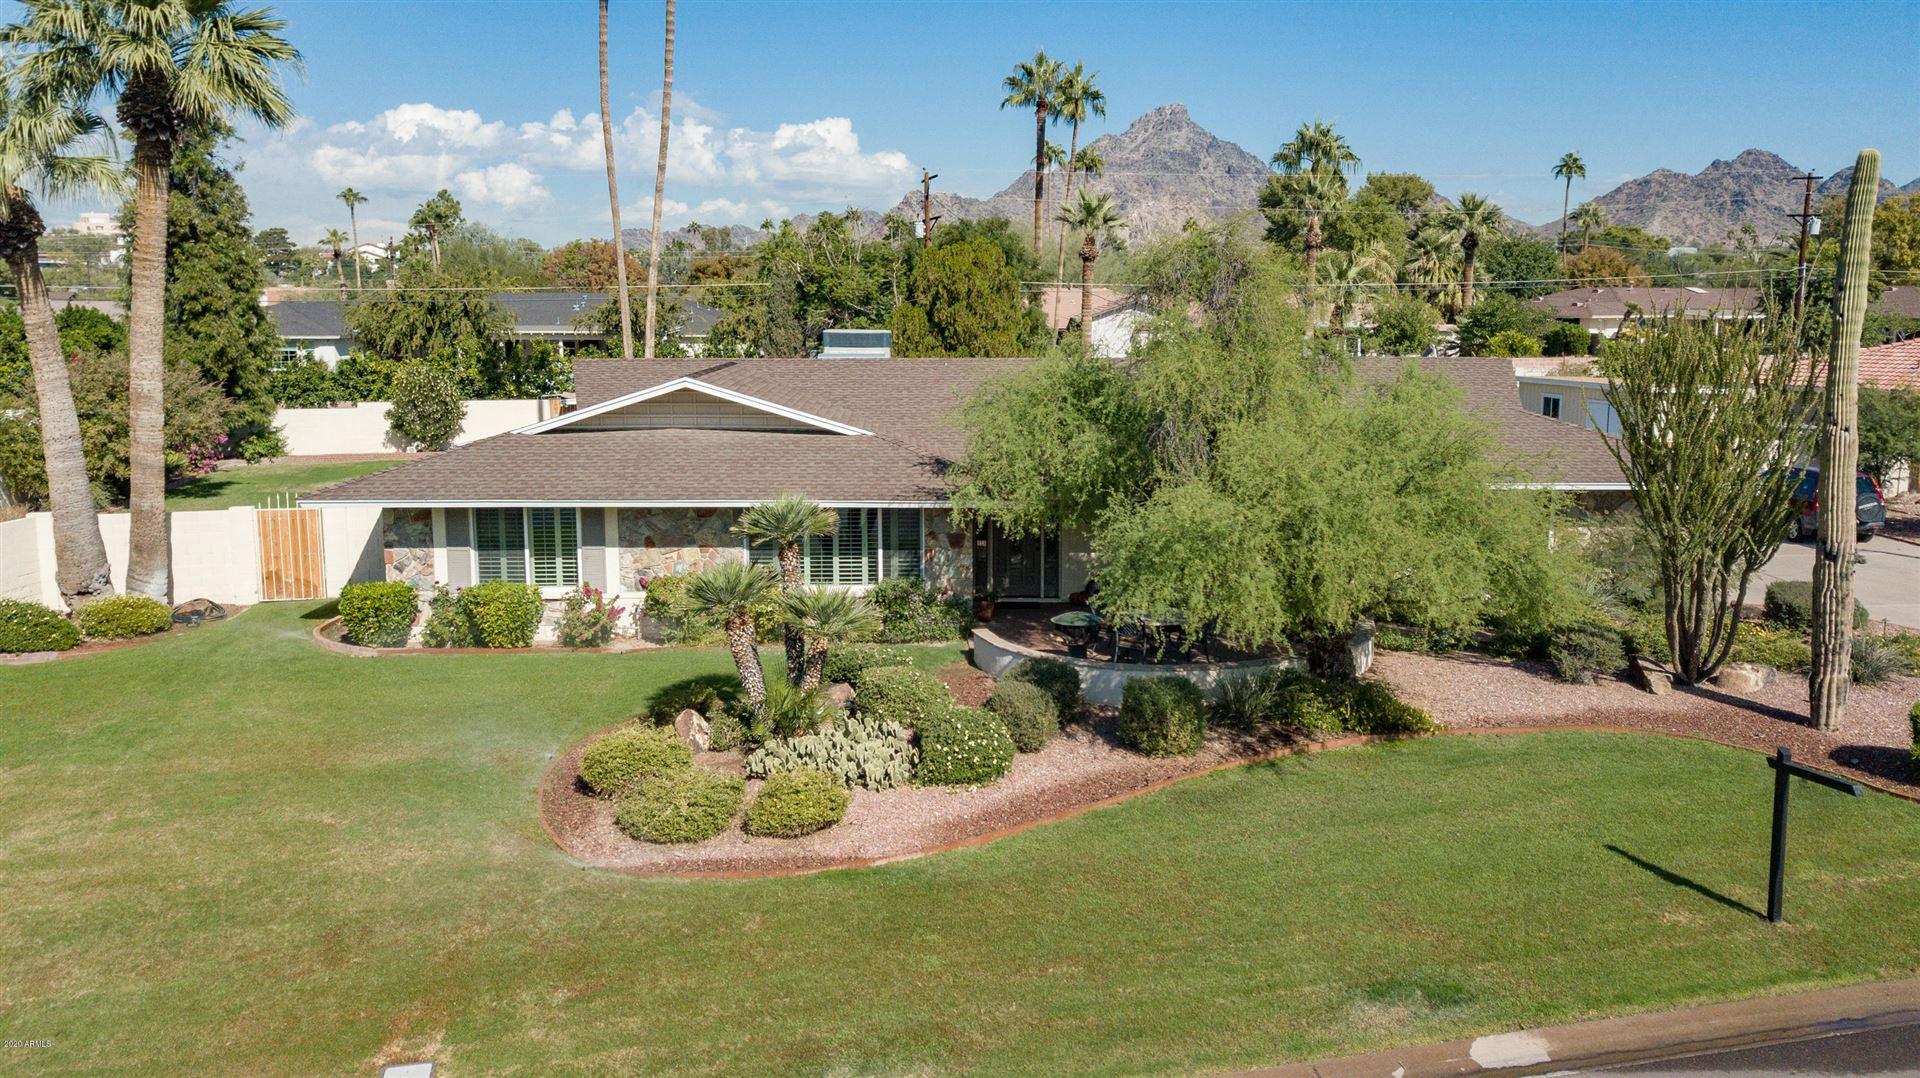 Property Image Of 2214 E San Juan Avenue In Phoenix, Az